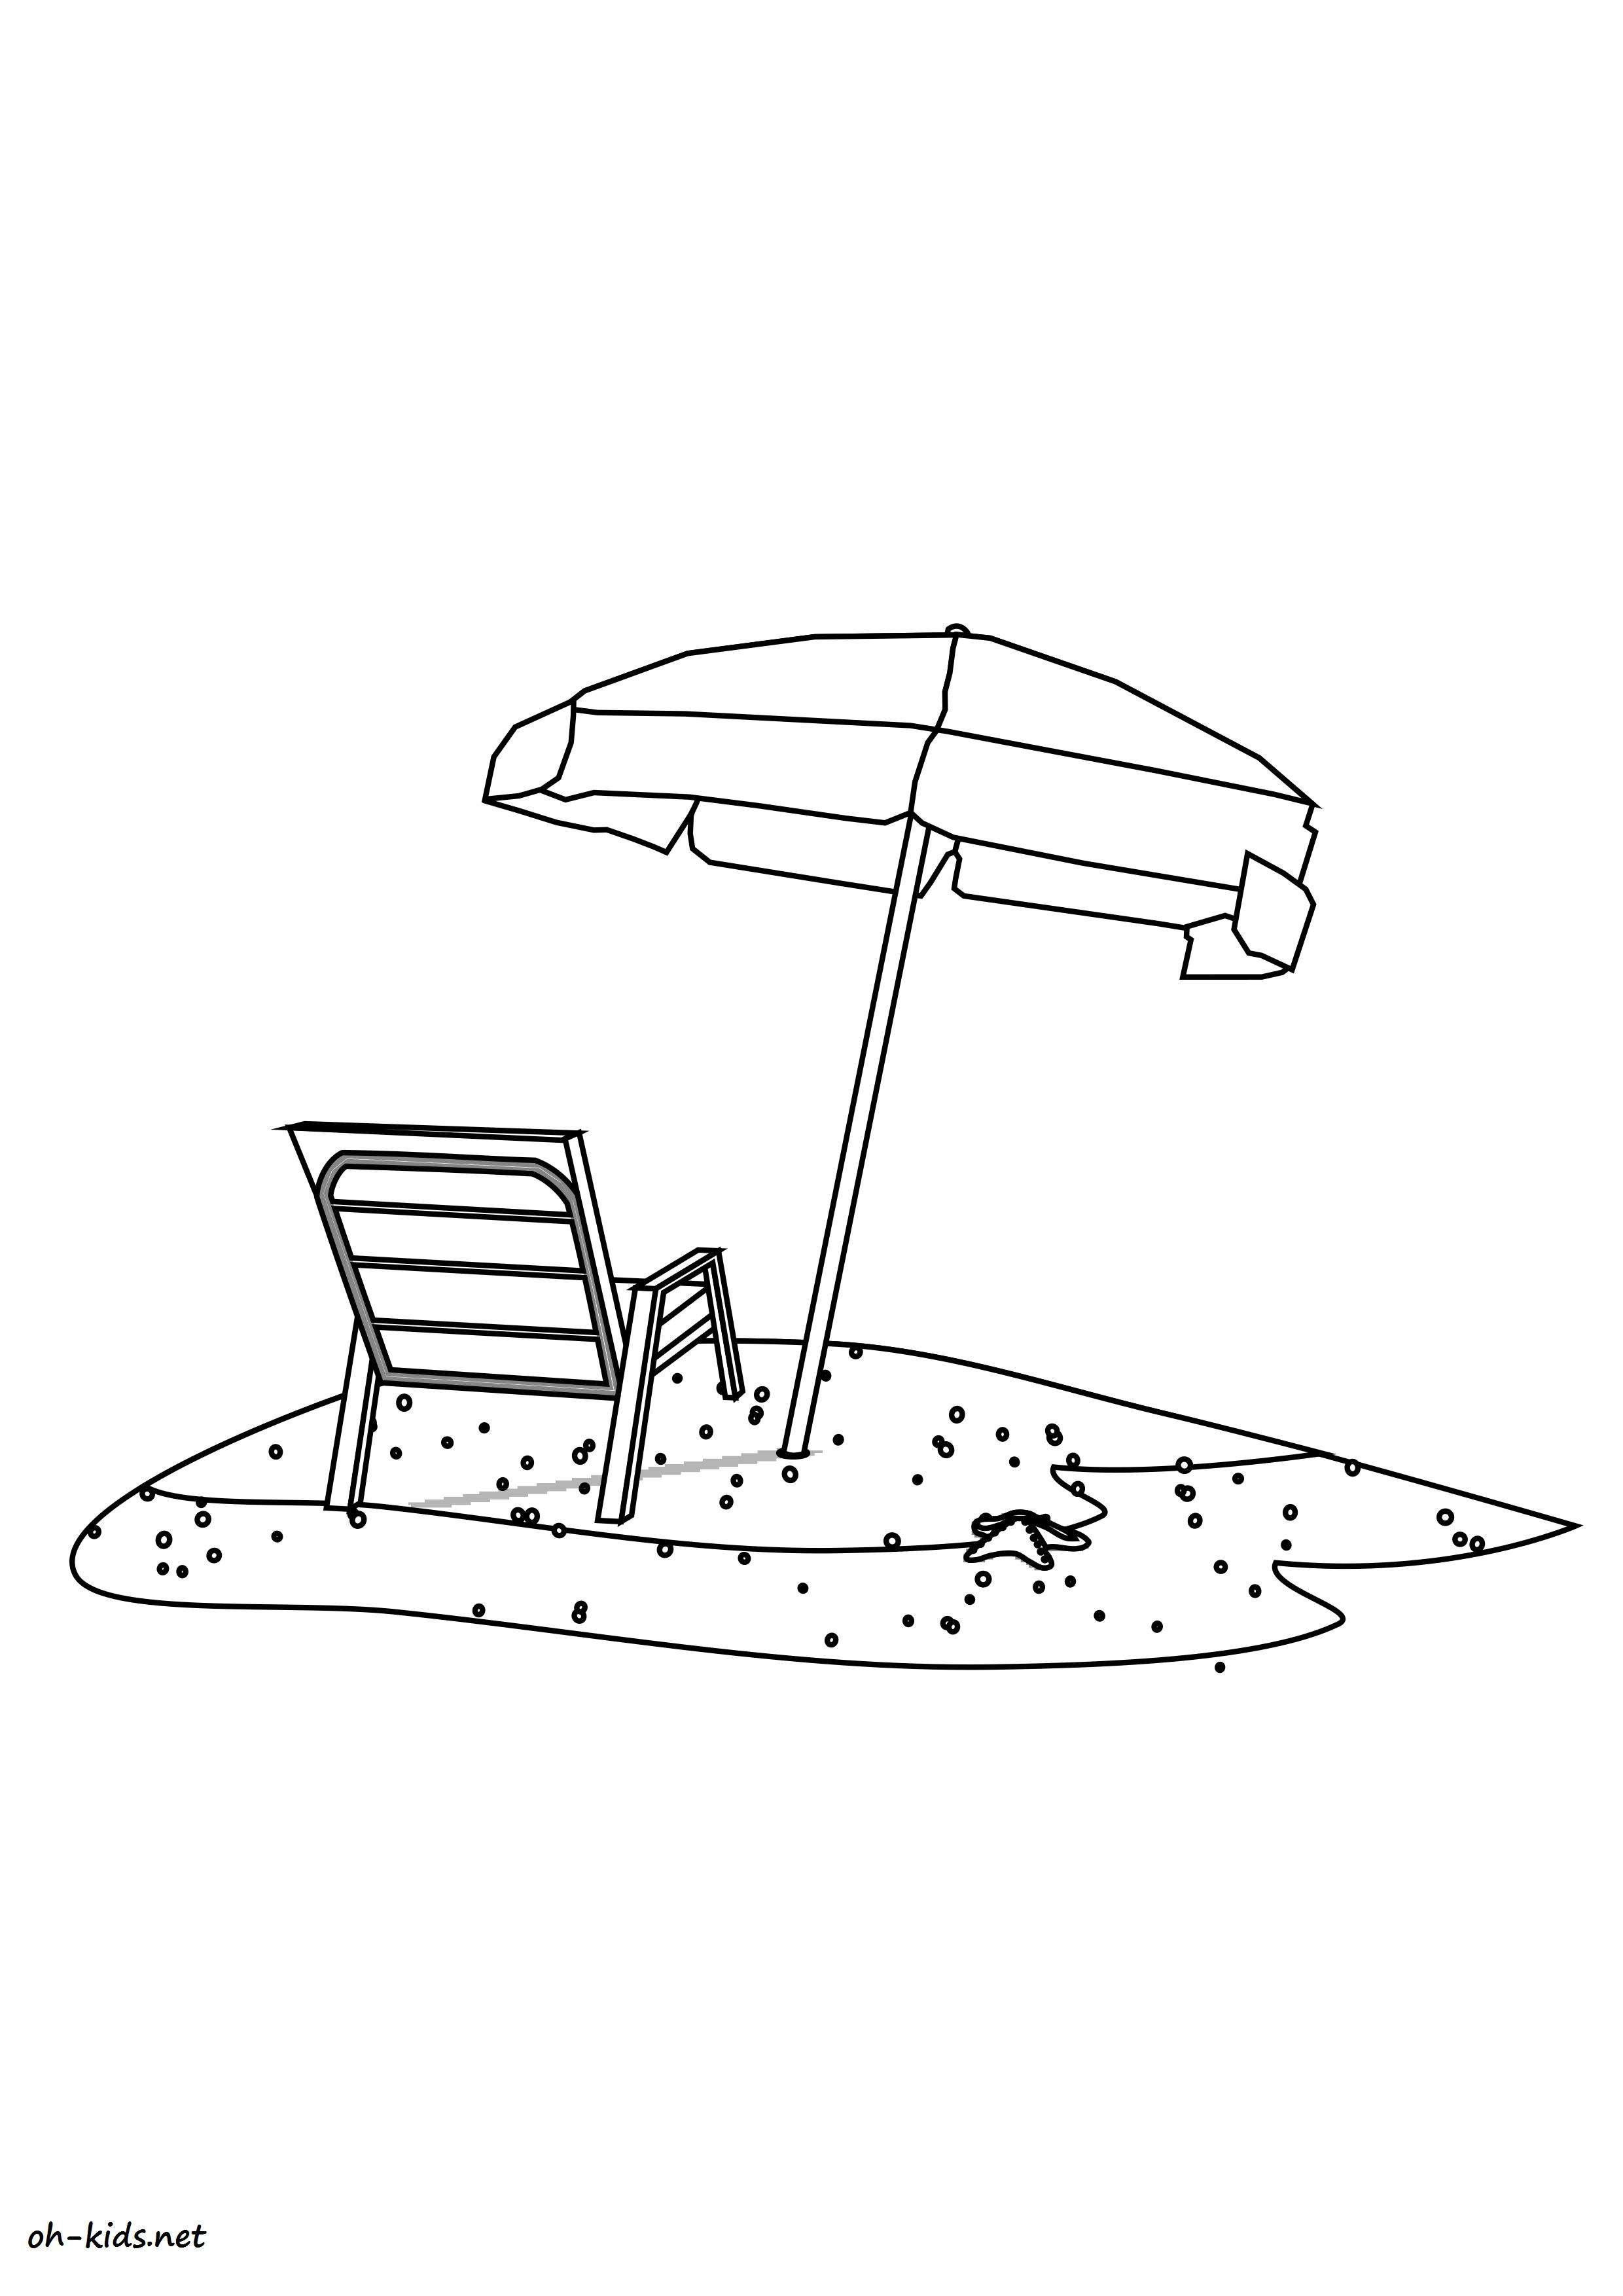 Coloriage plage a imprimer - Dessin #1458